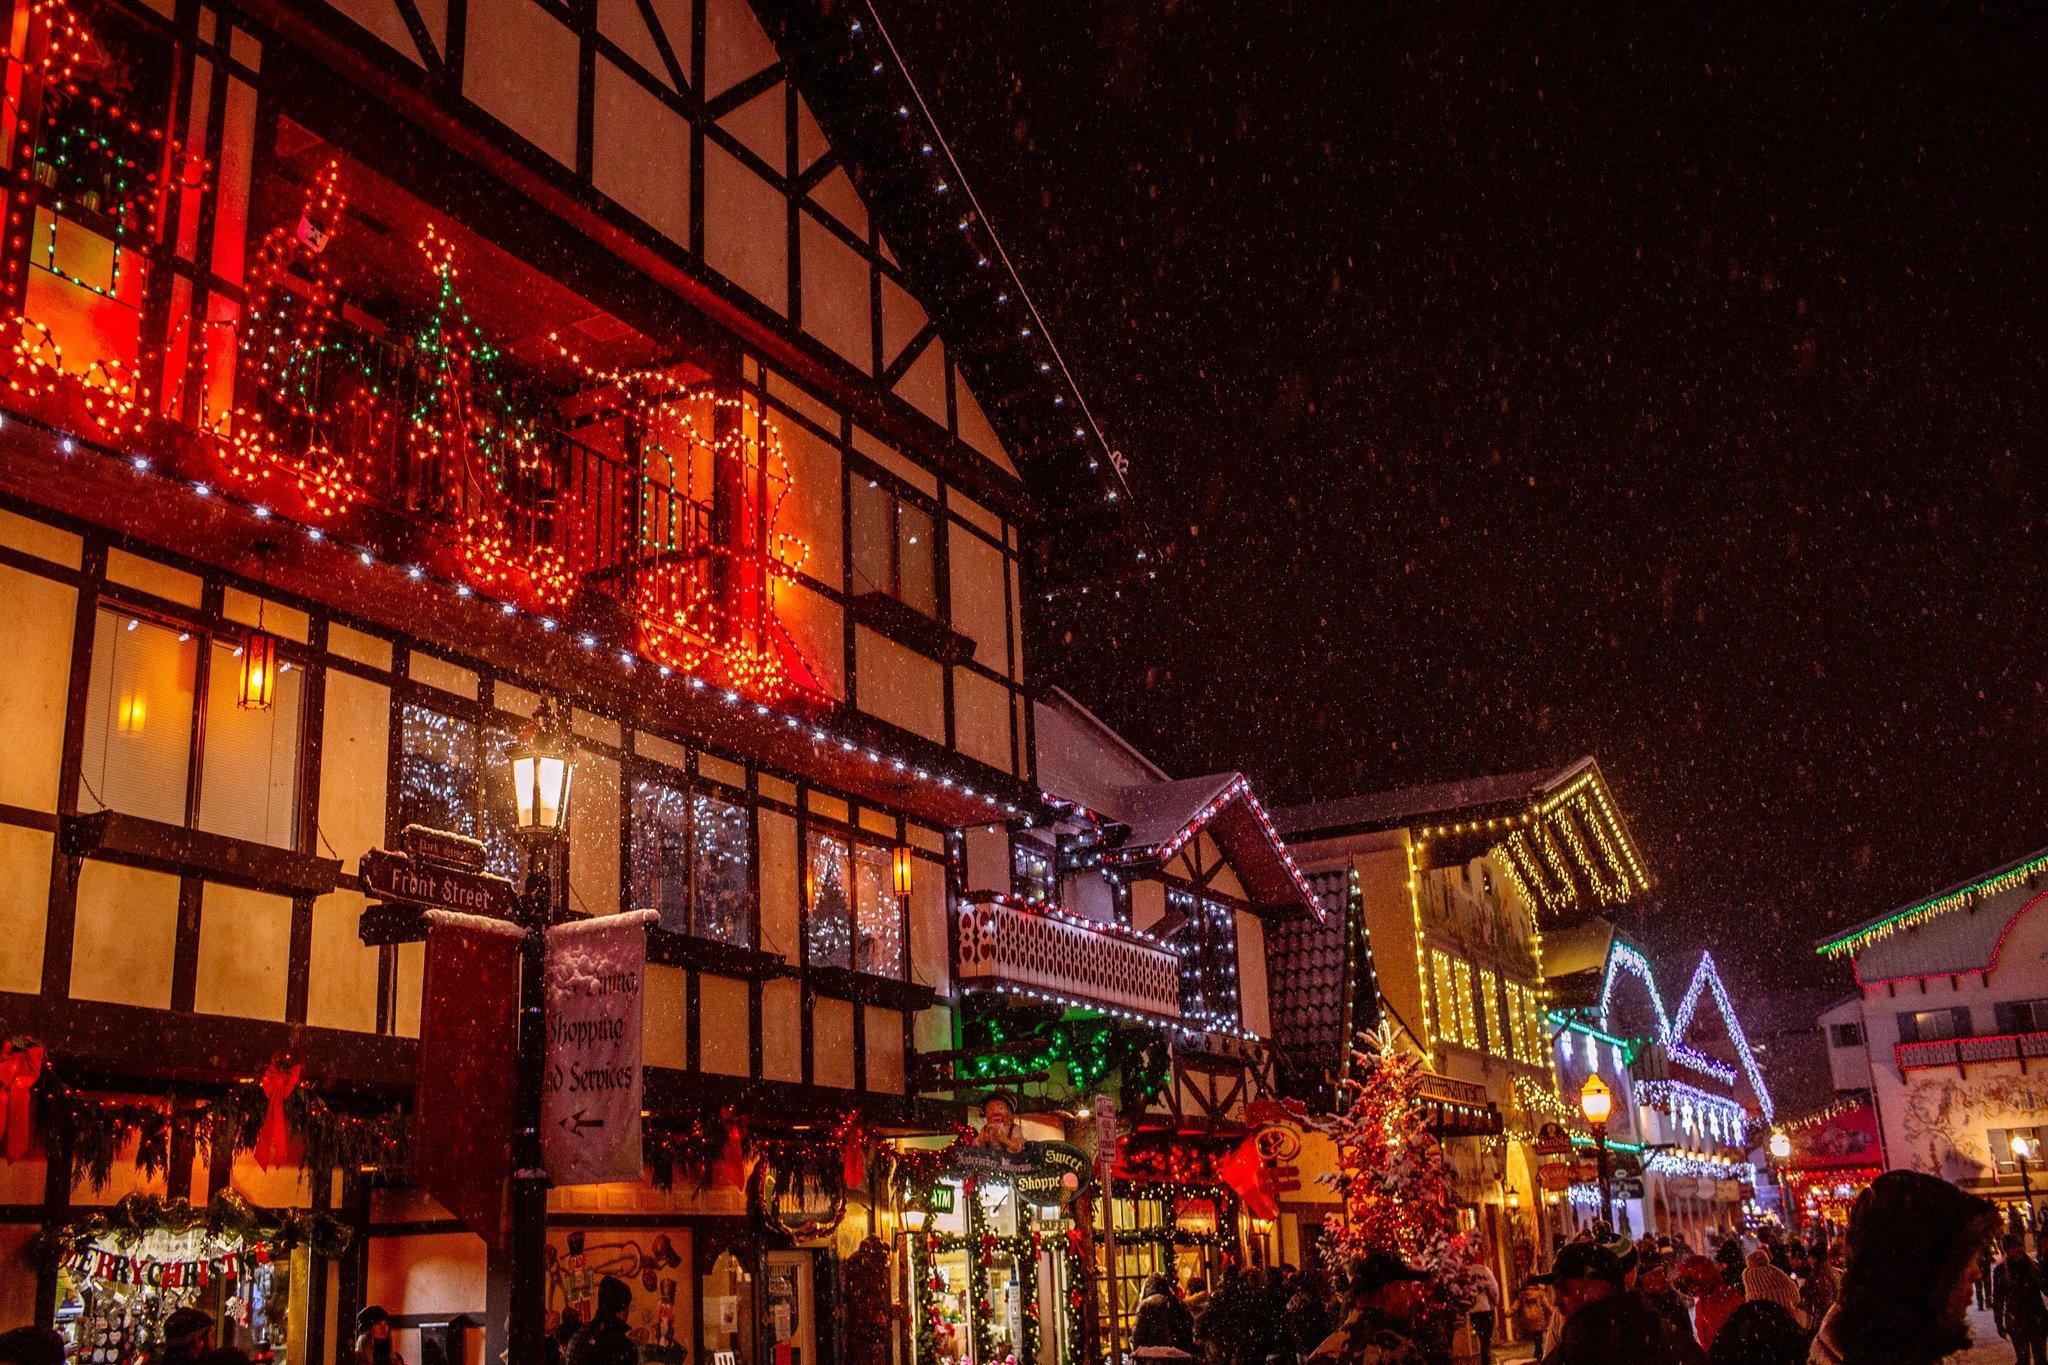 Leavenworth Christmas 2021 12 Festive Leavenworth Christmas Activities You Ll Love Update 2019